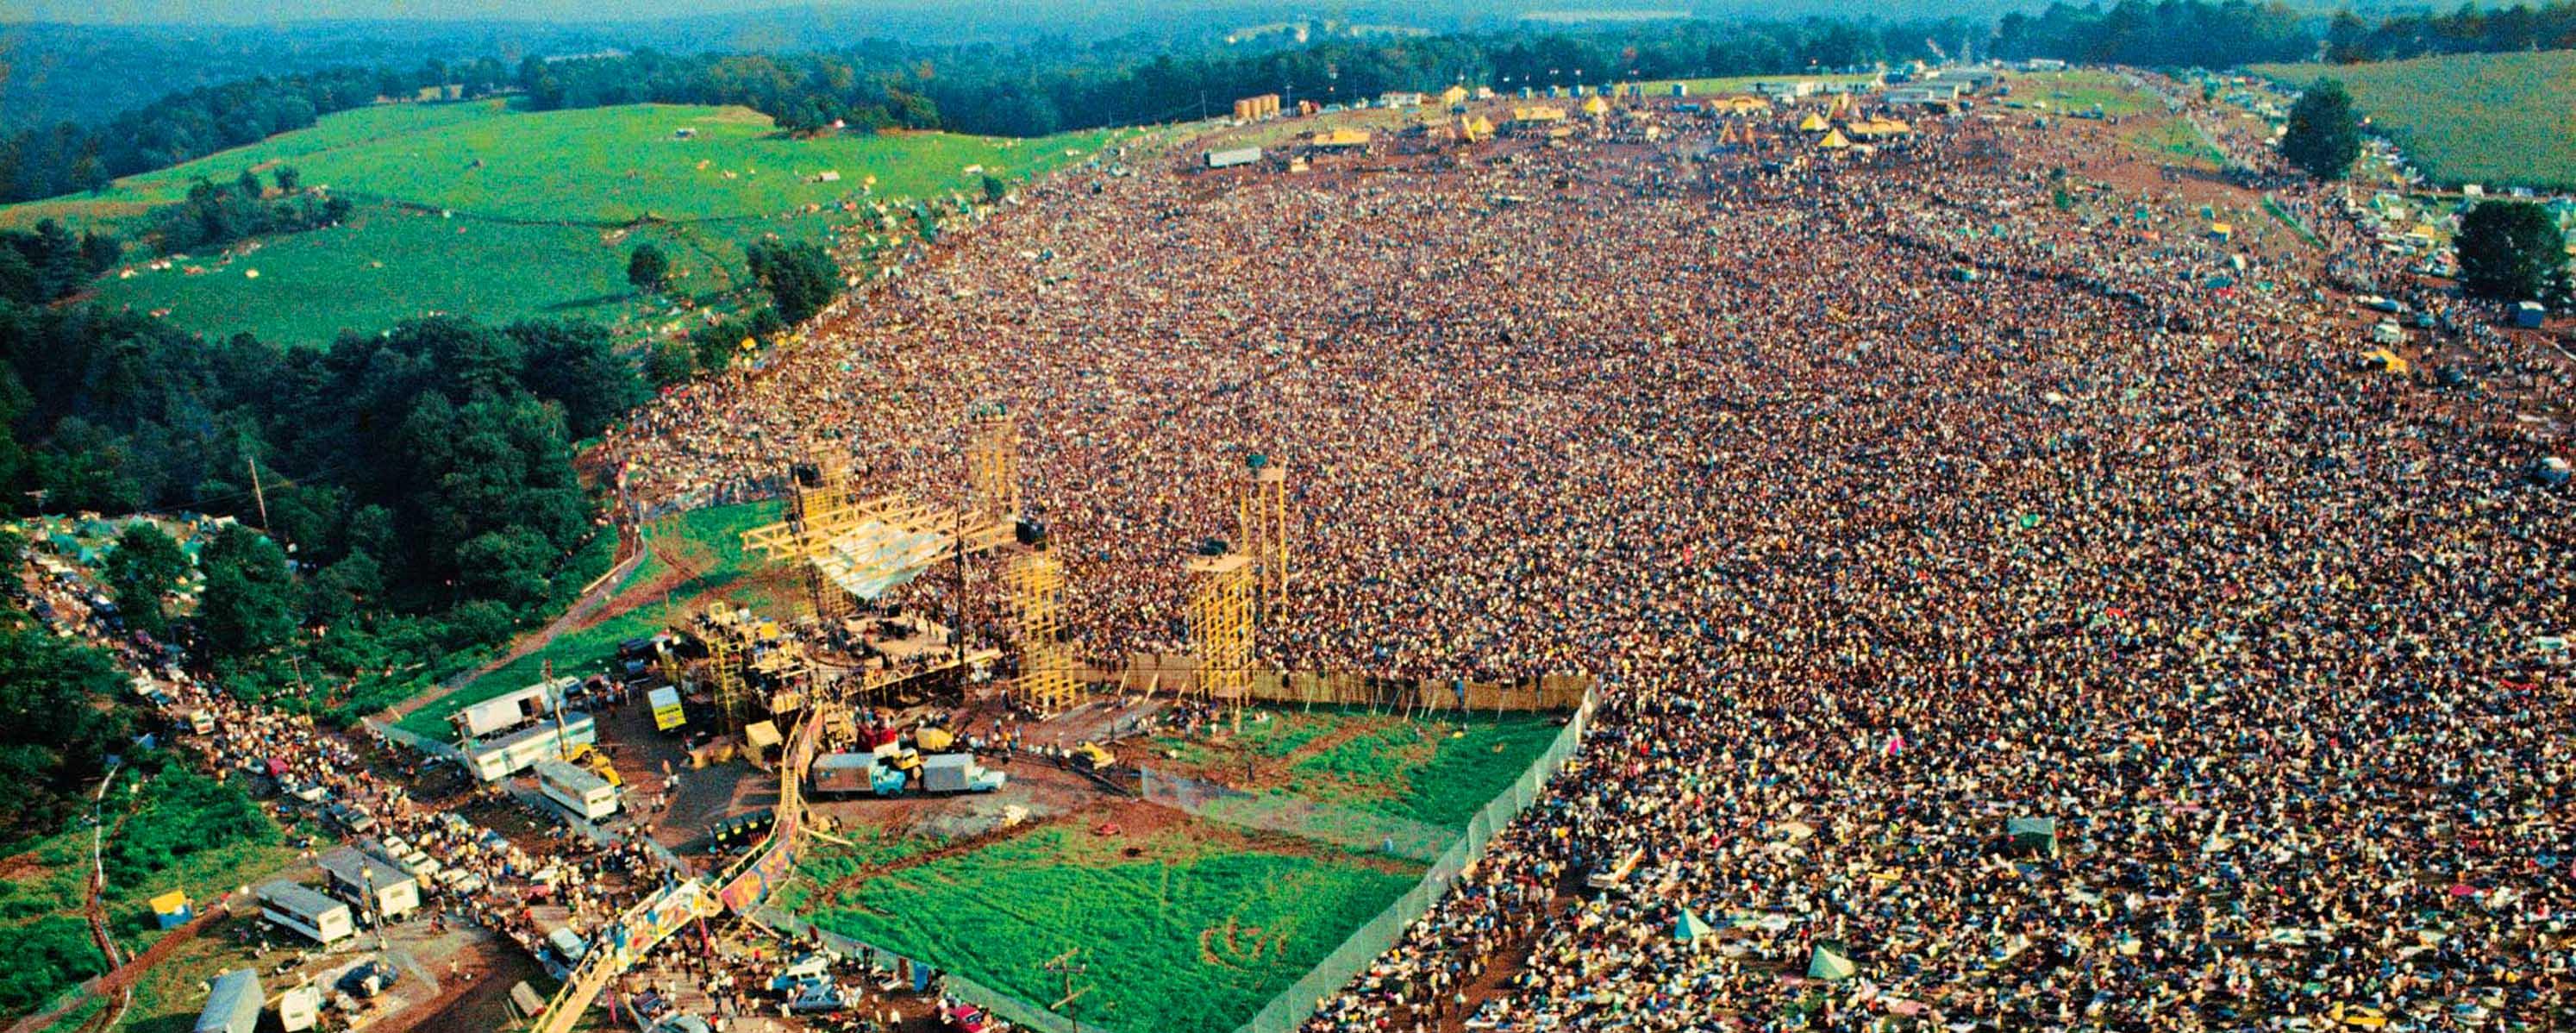 Life-at-Woodstock-1969